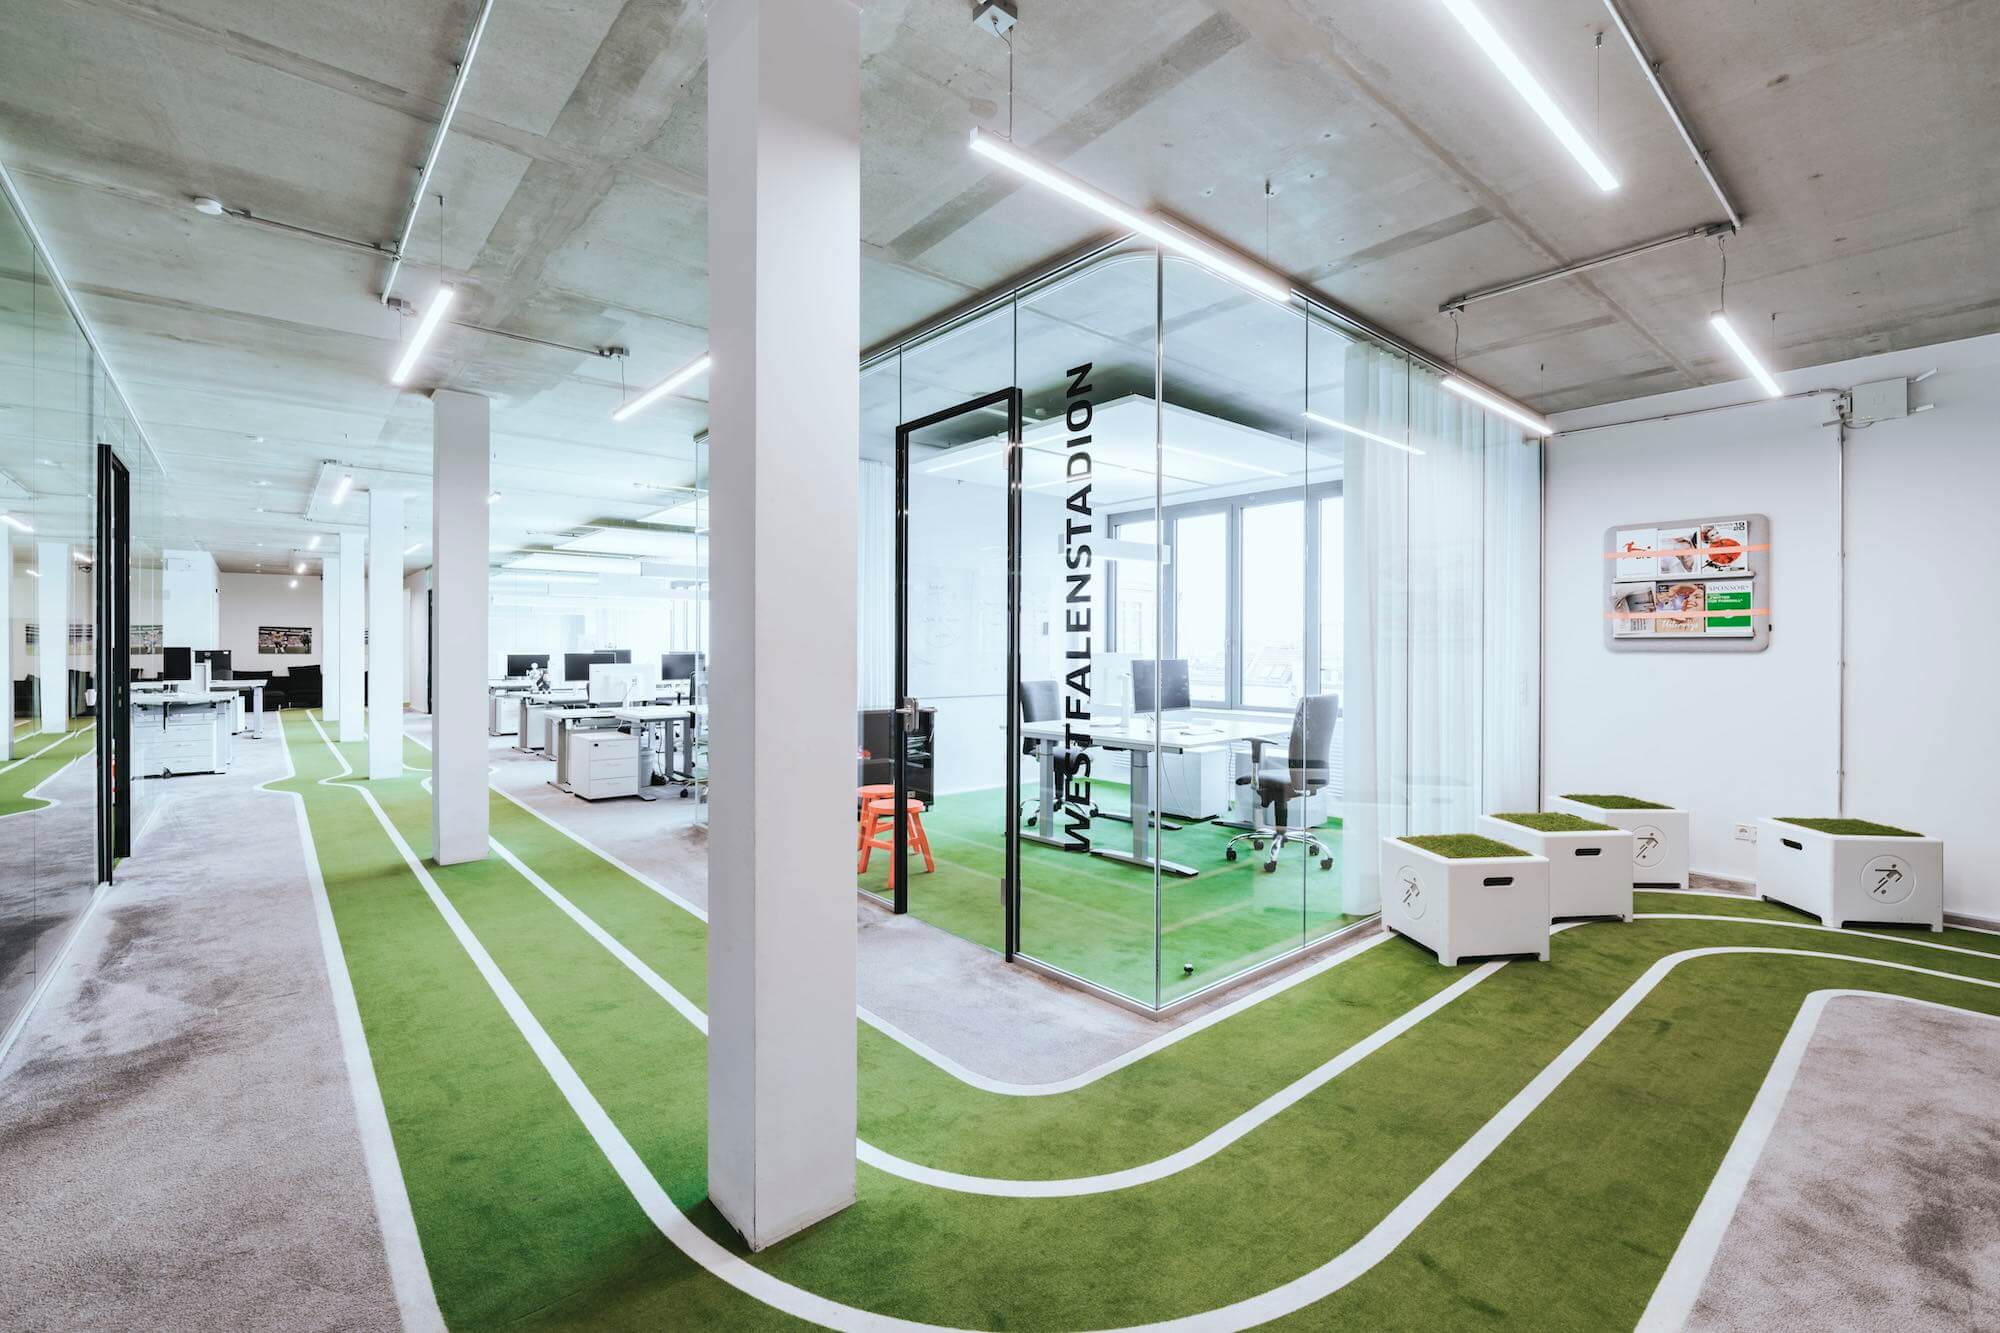 Onefootball Startup Büro TKEZ Architekten Westfalenstadion Büro verglast